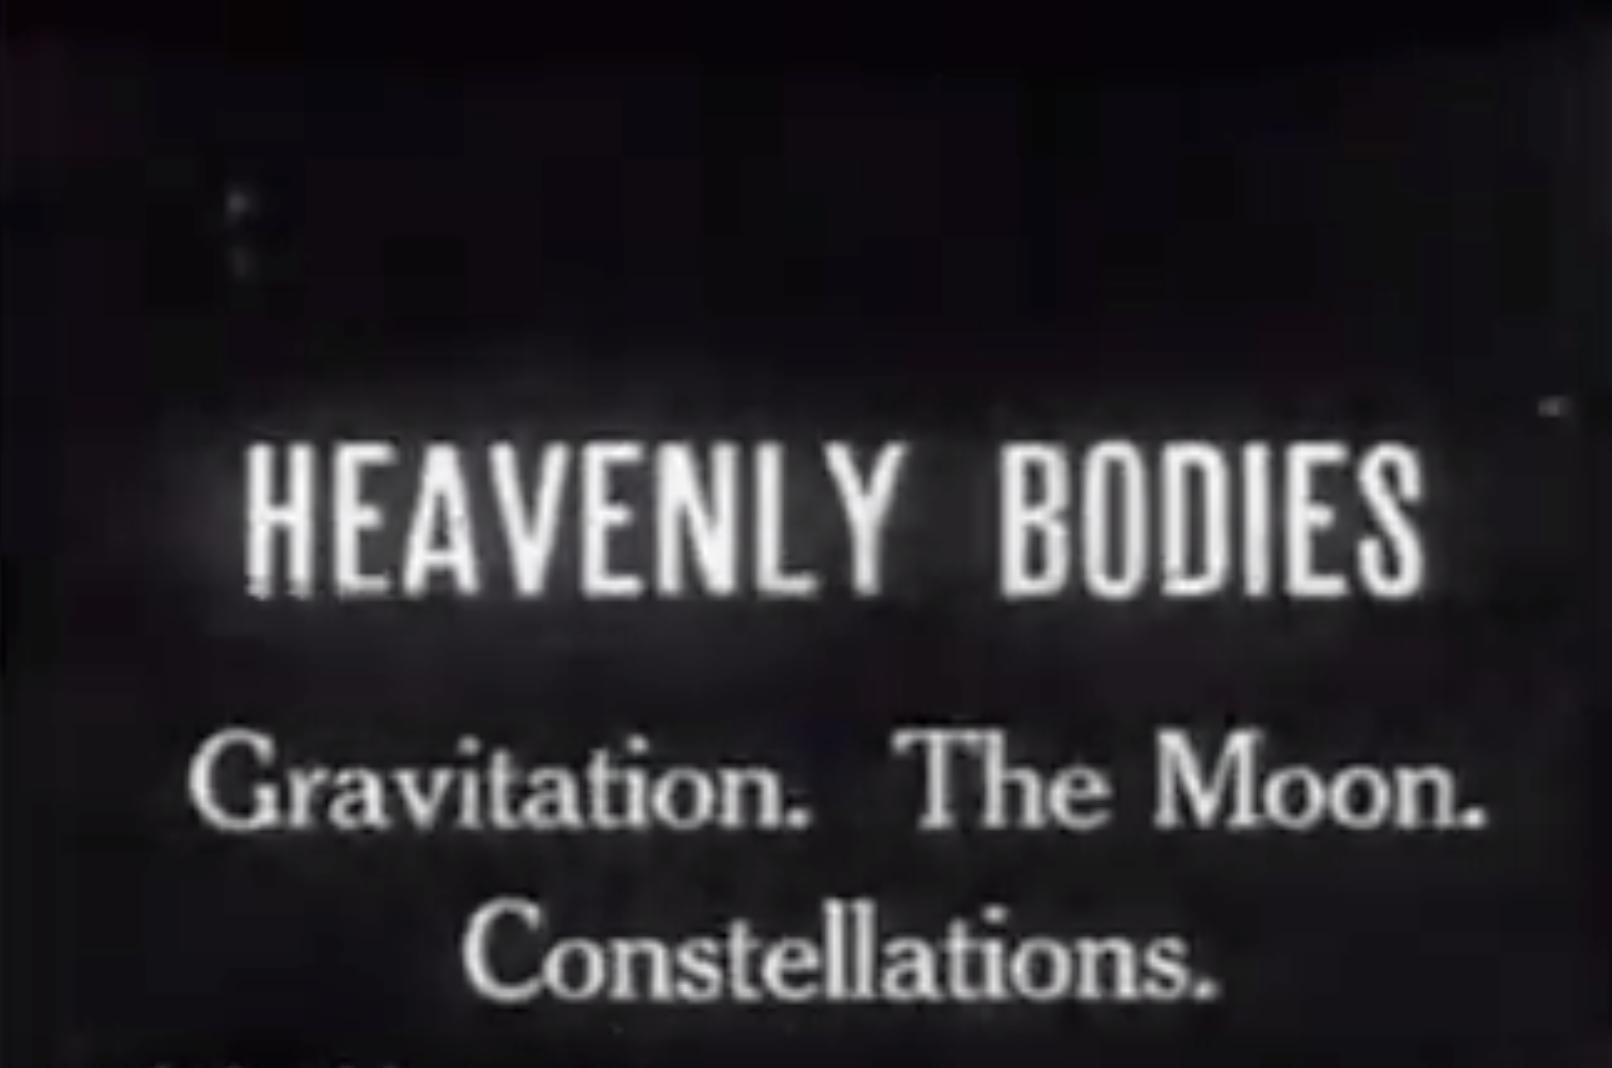 Heavenly Bodies - 1920